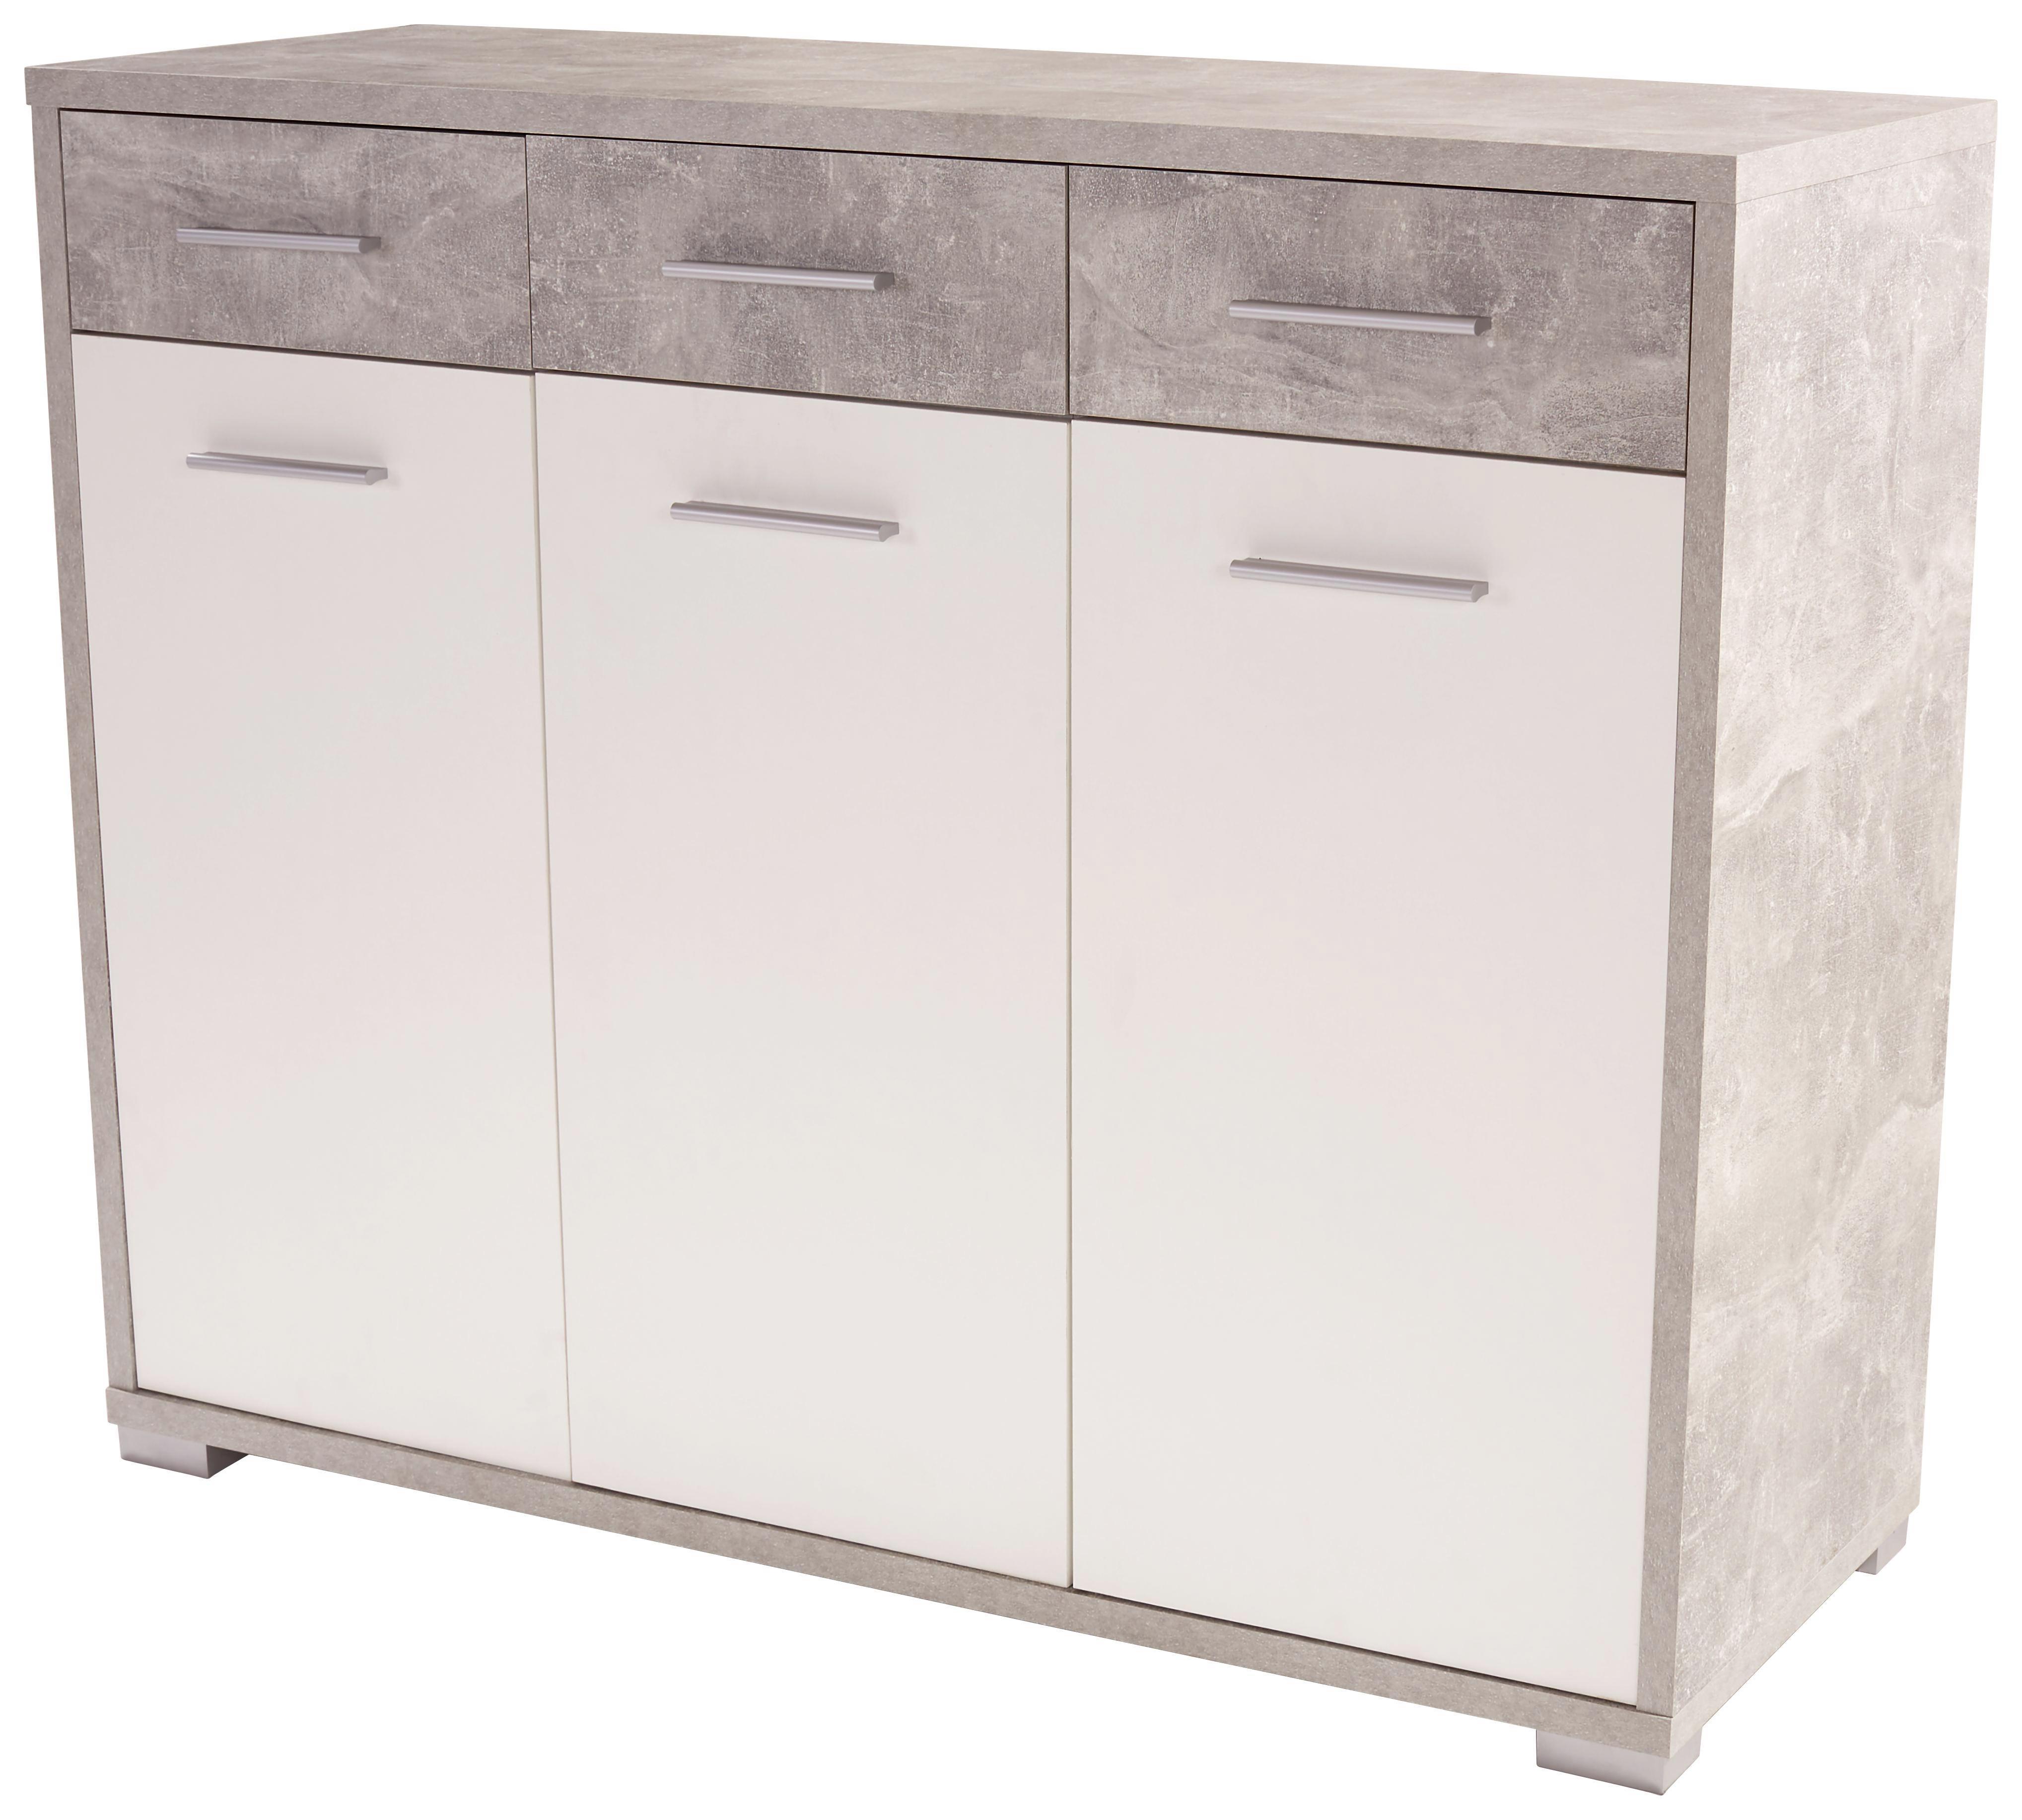 Komoda Q-big New Qbk01 - bílá/šedá, Moderní, dřevo (144/105/44cm)